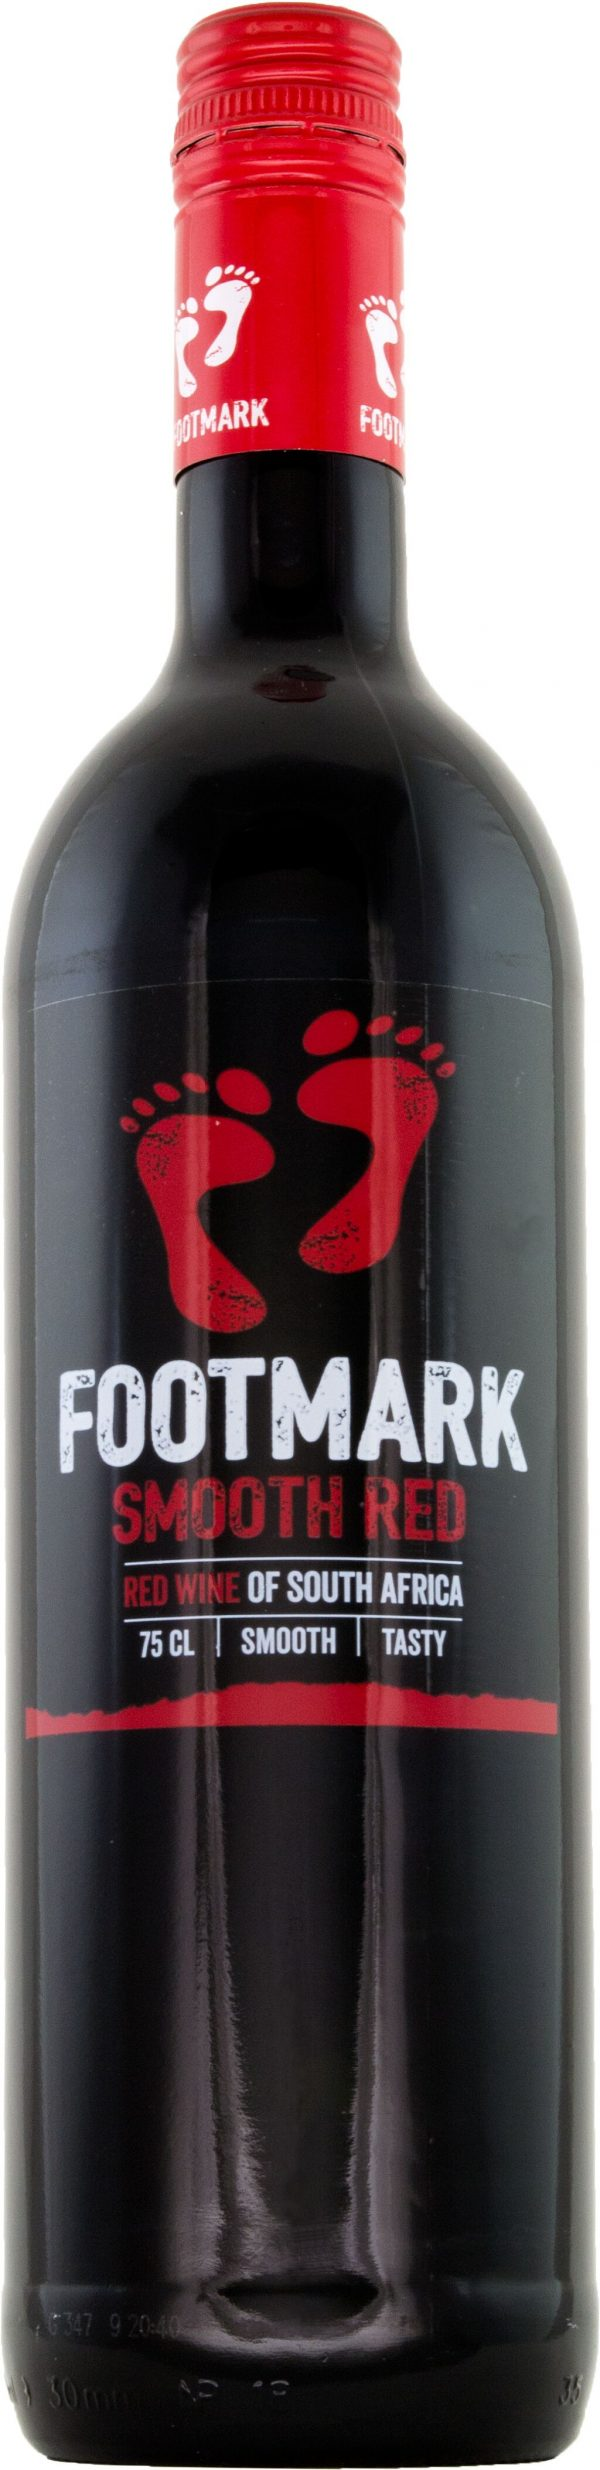 Footmark Smooth Red